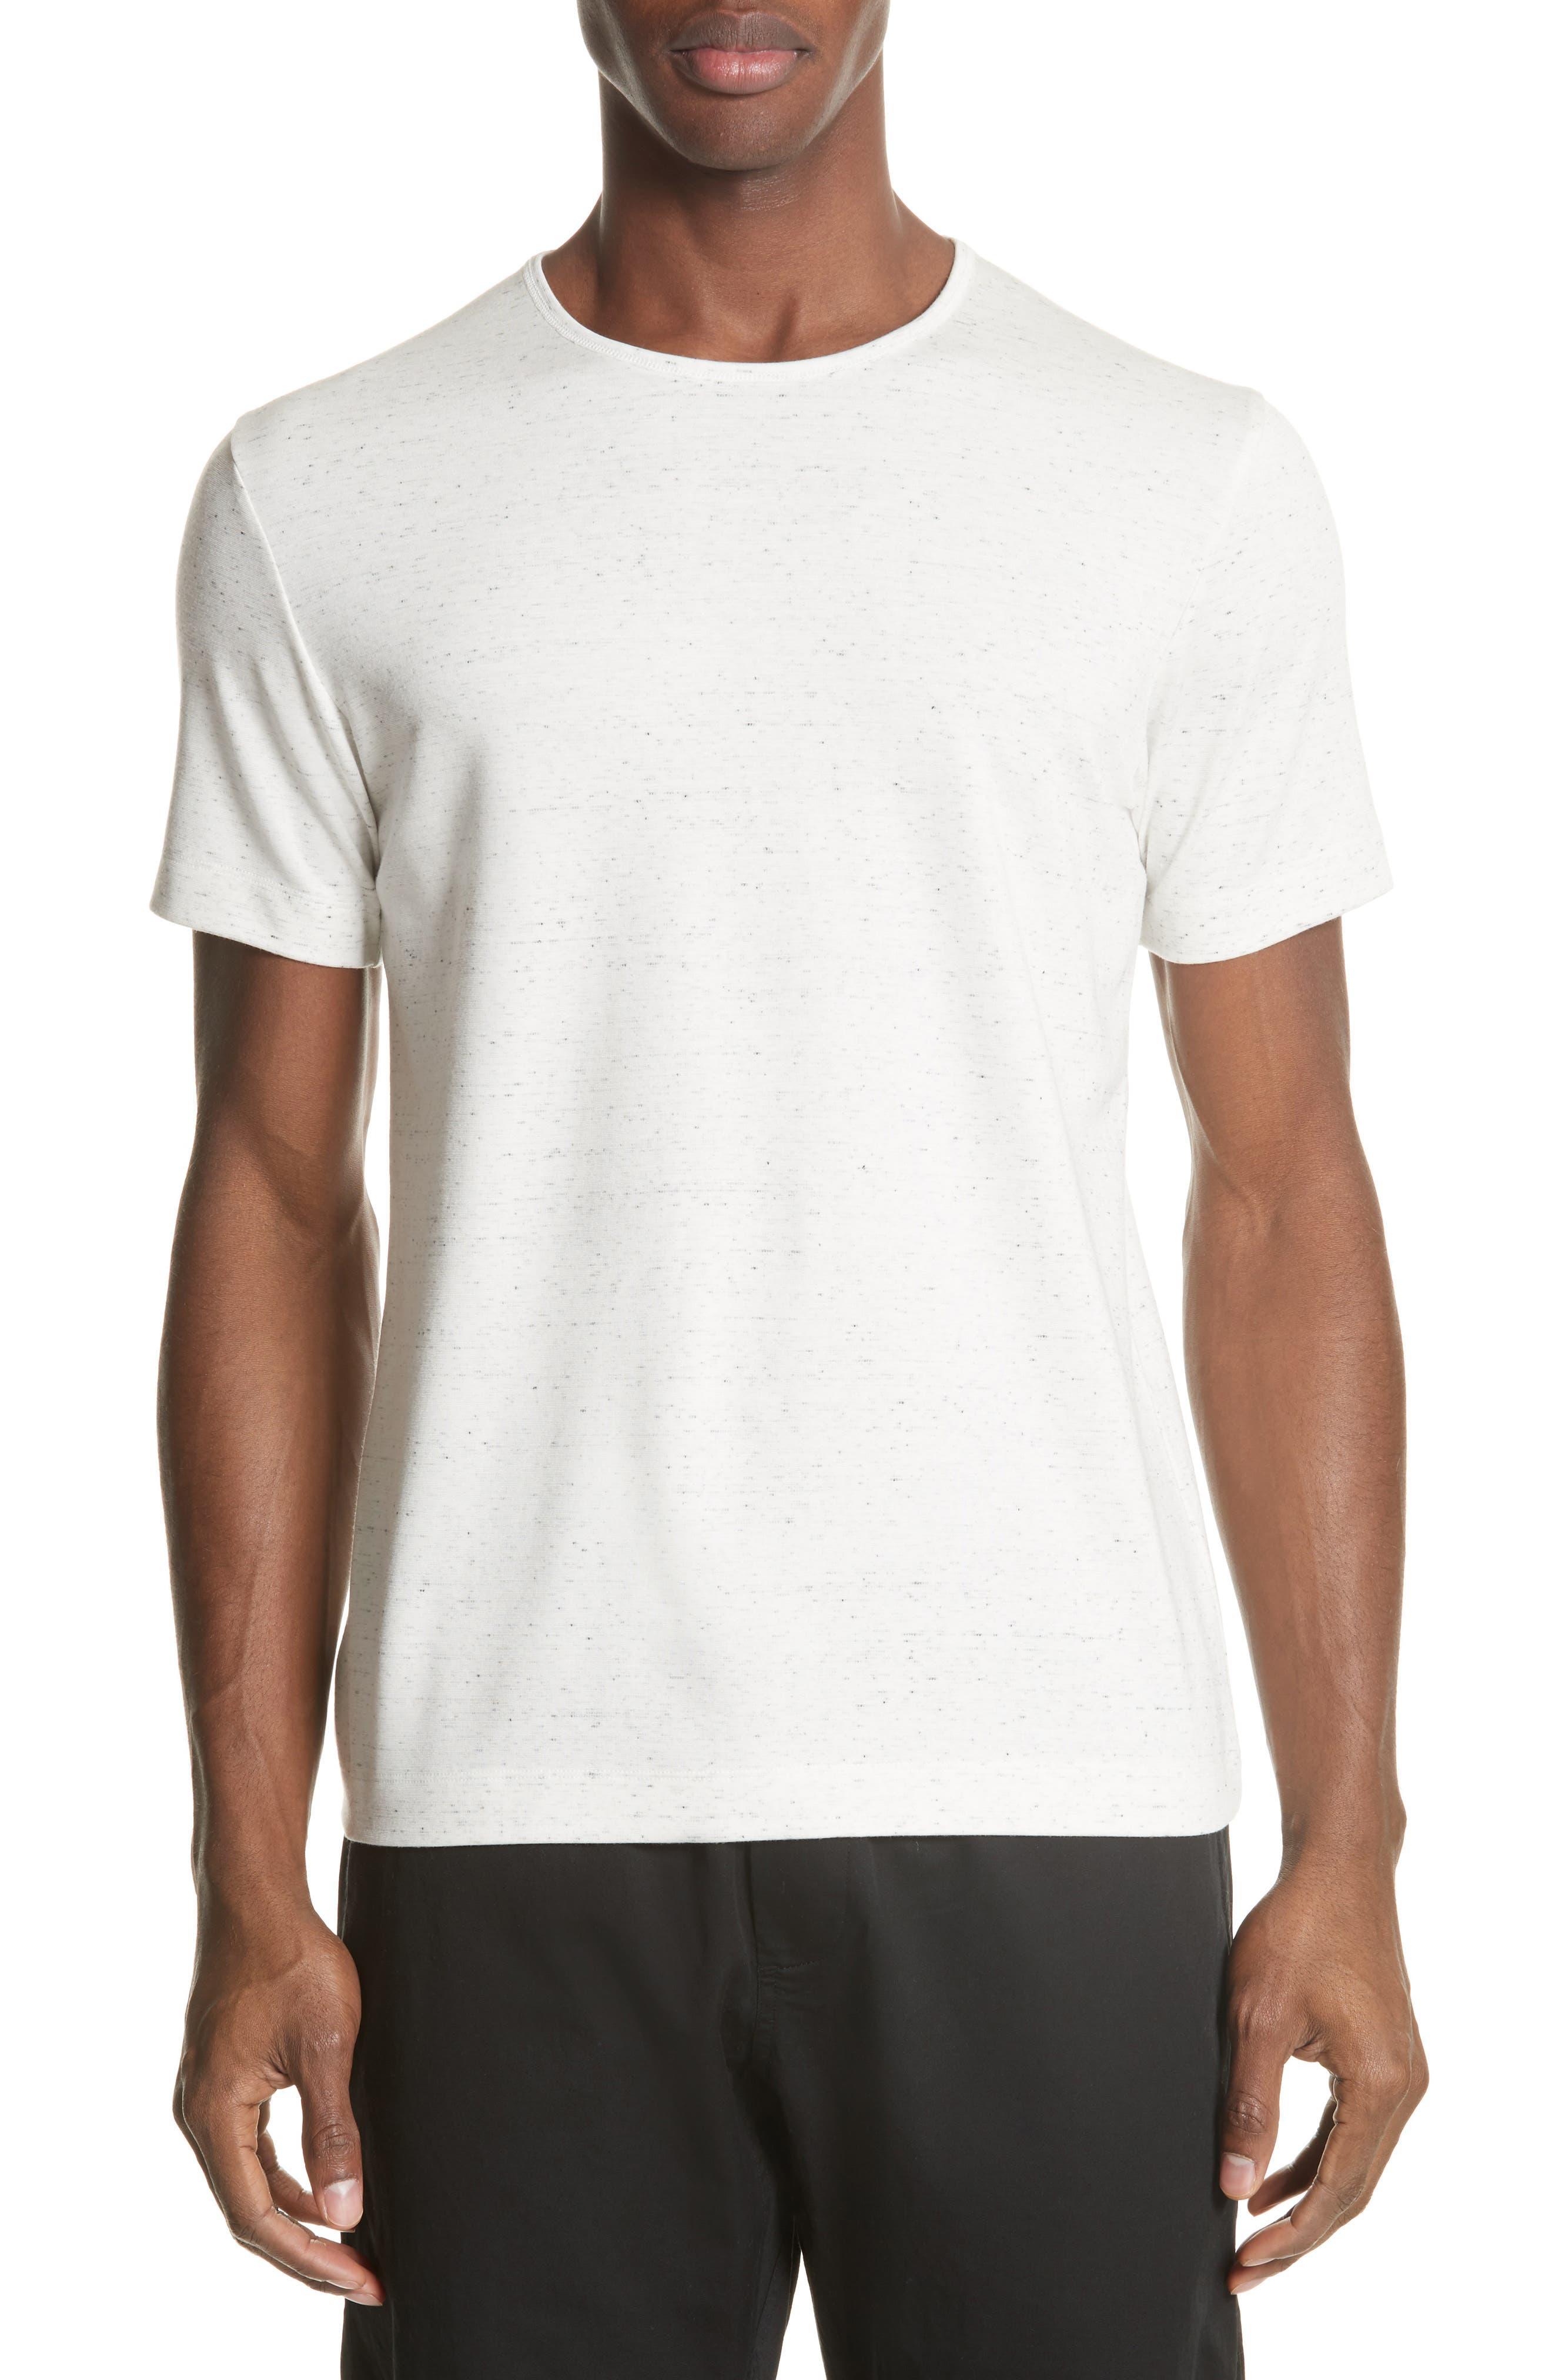 Signals T-Shirt,                             Main thumbnail 1, color,                             Static White